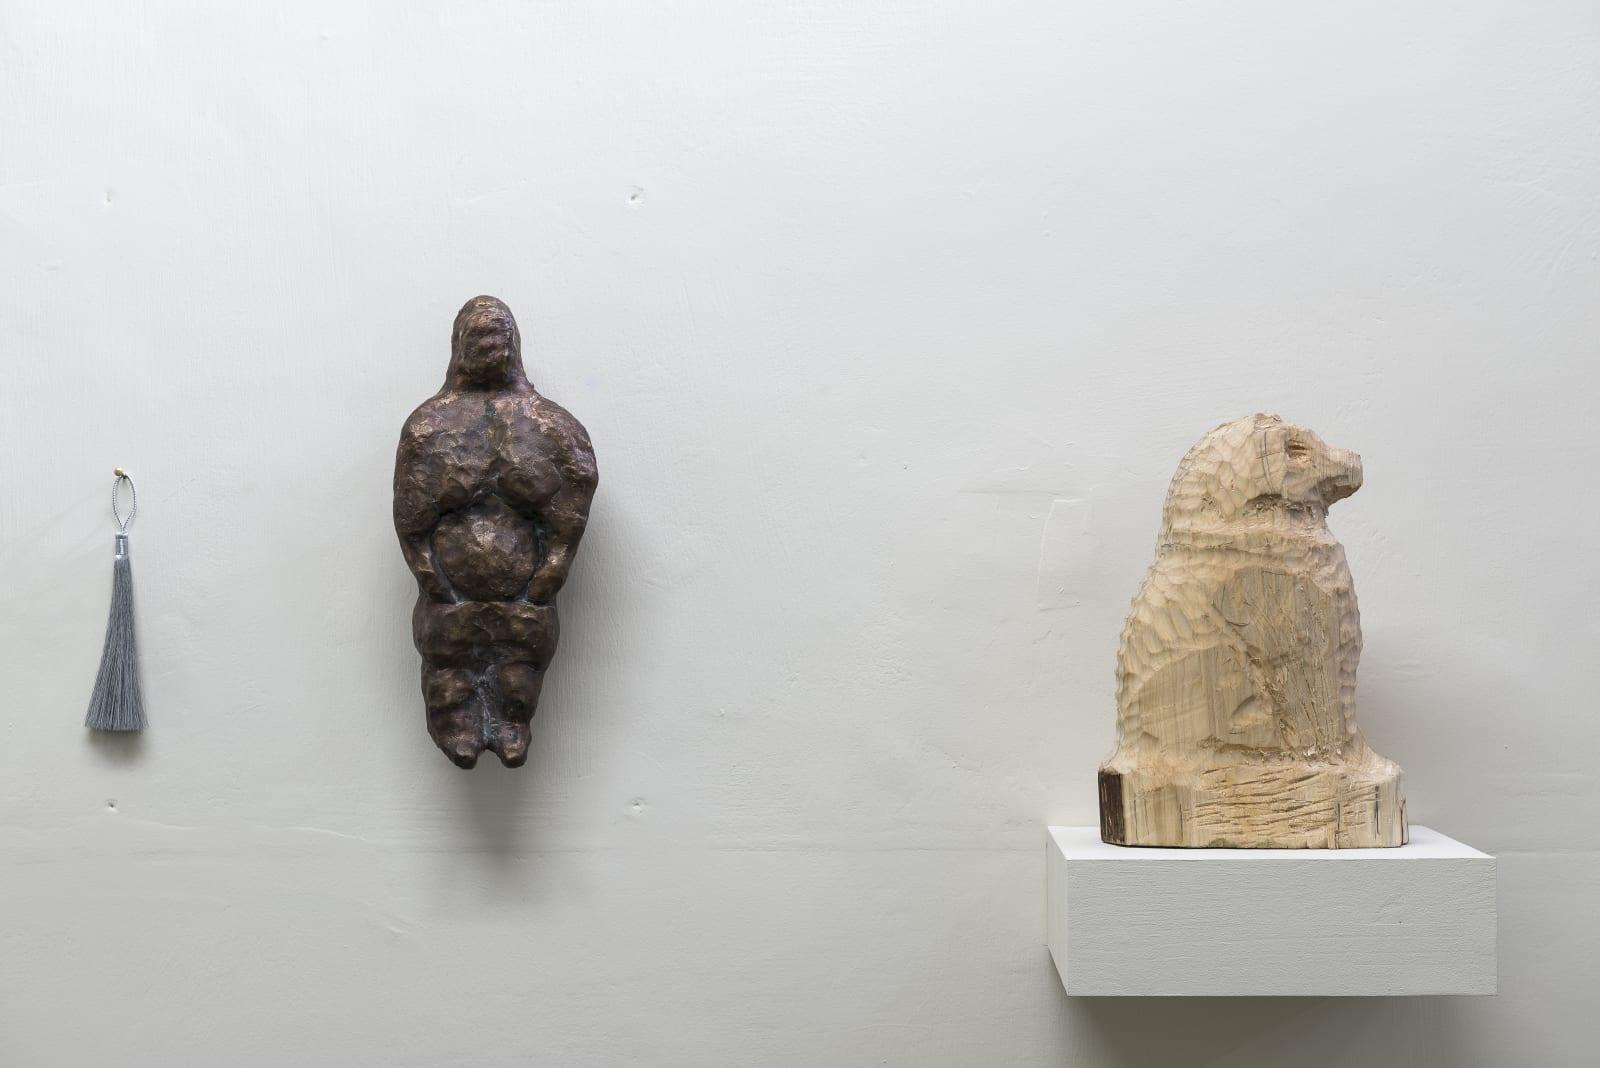 Evgeny Antufiev, Untitled, 2015, bronze sculpture cm 30 x 13 x 7, wooden sculpture cm 26 x 17 x 8, tassel cm 17